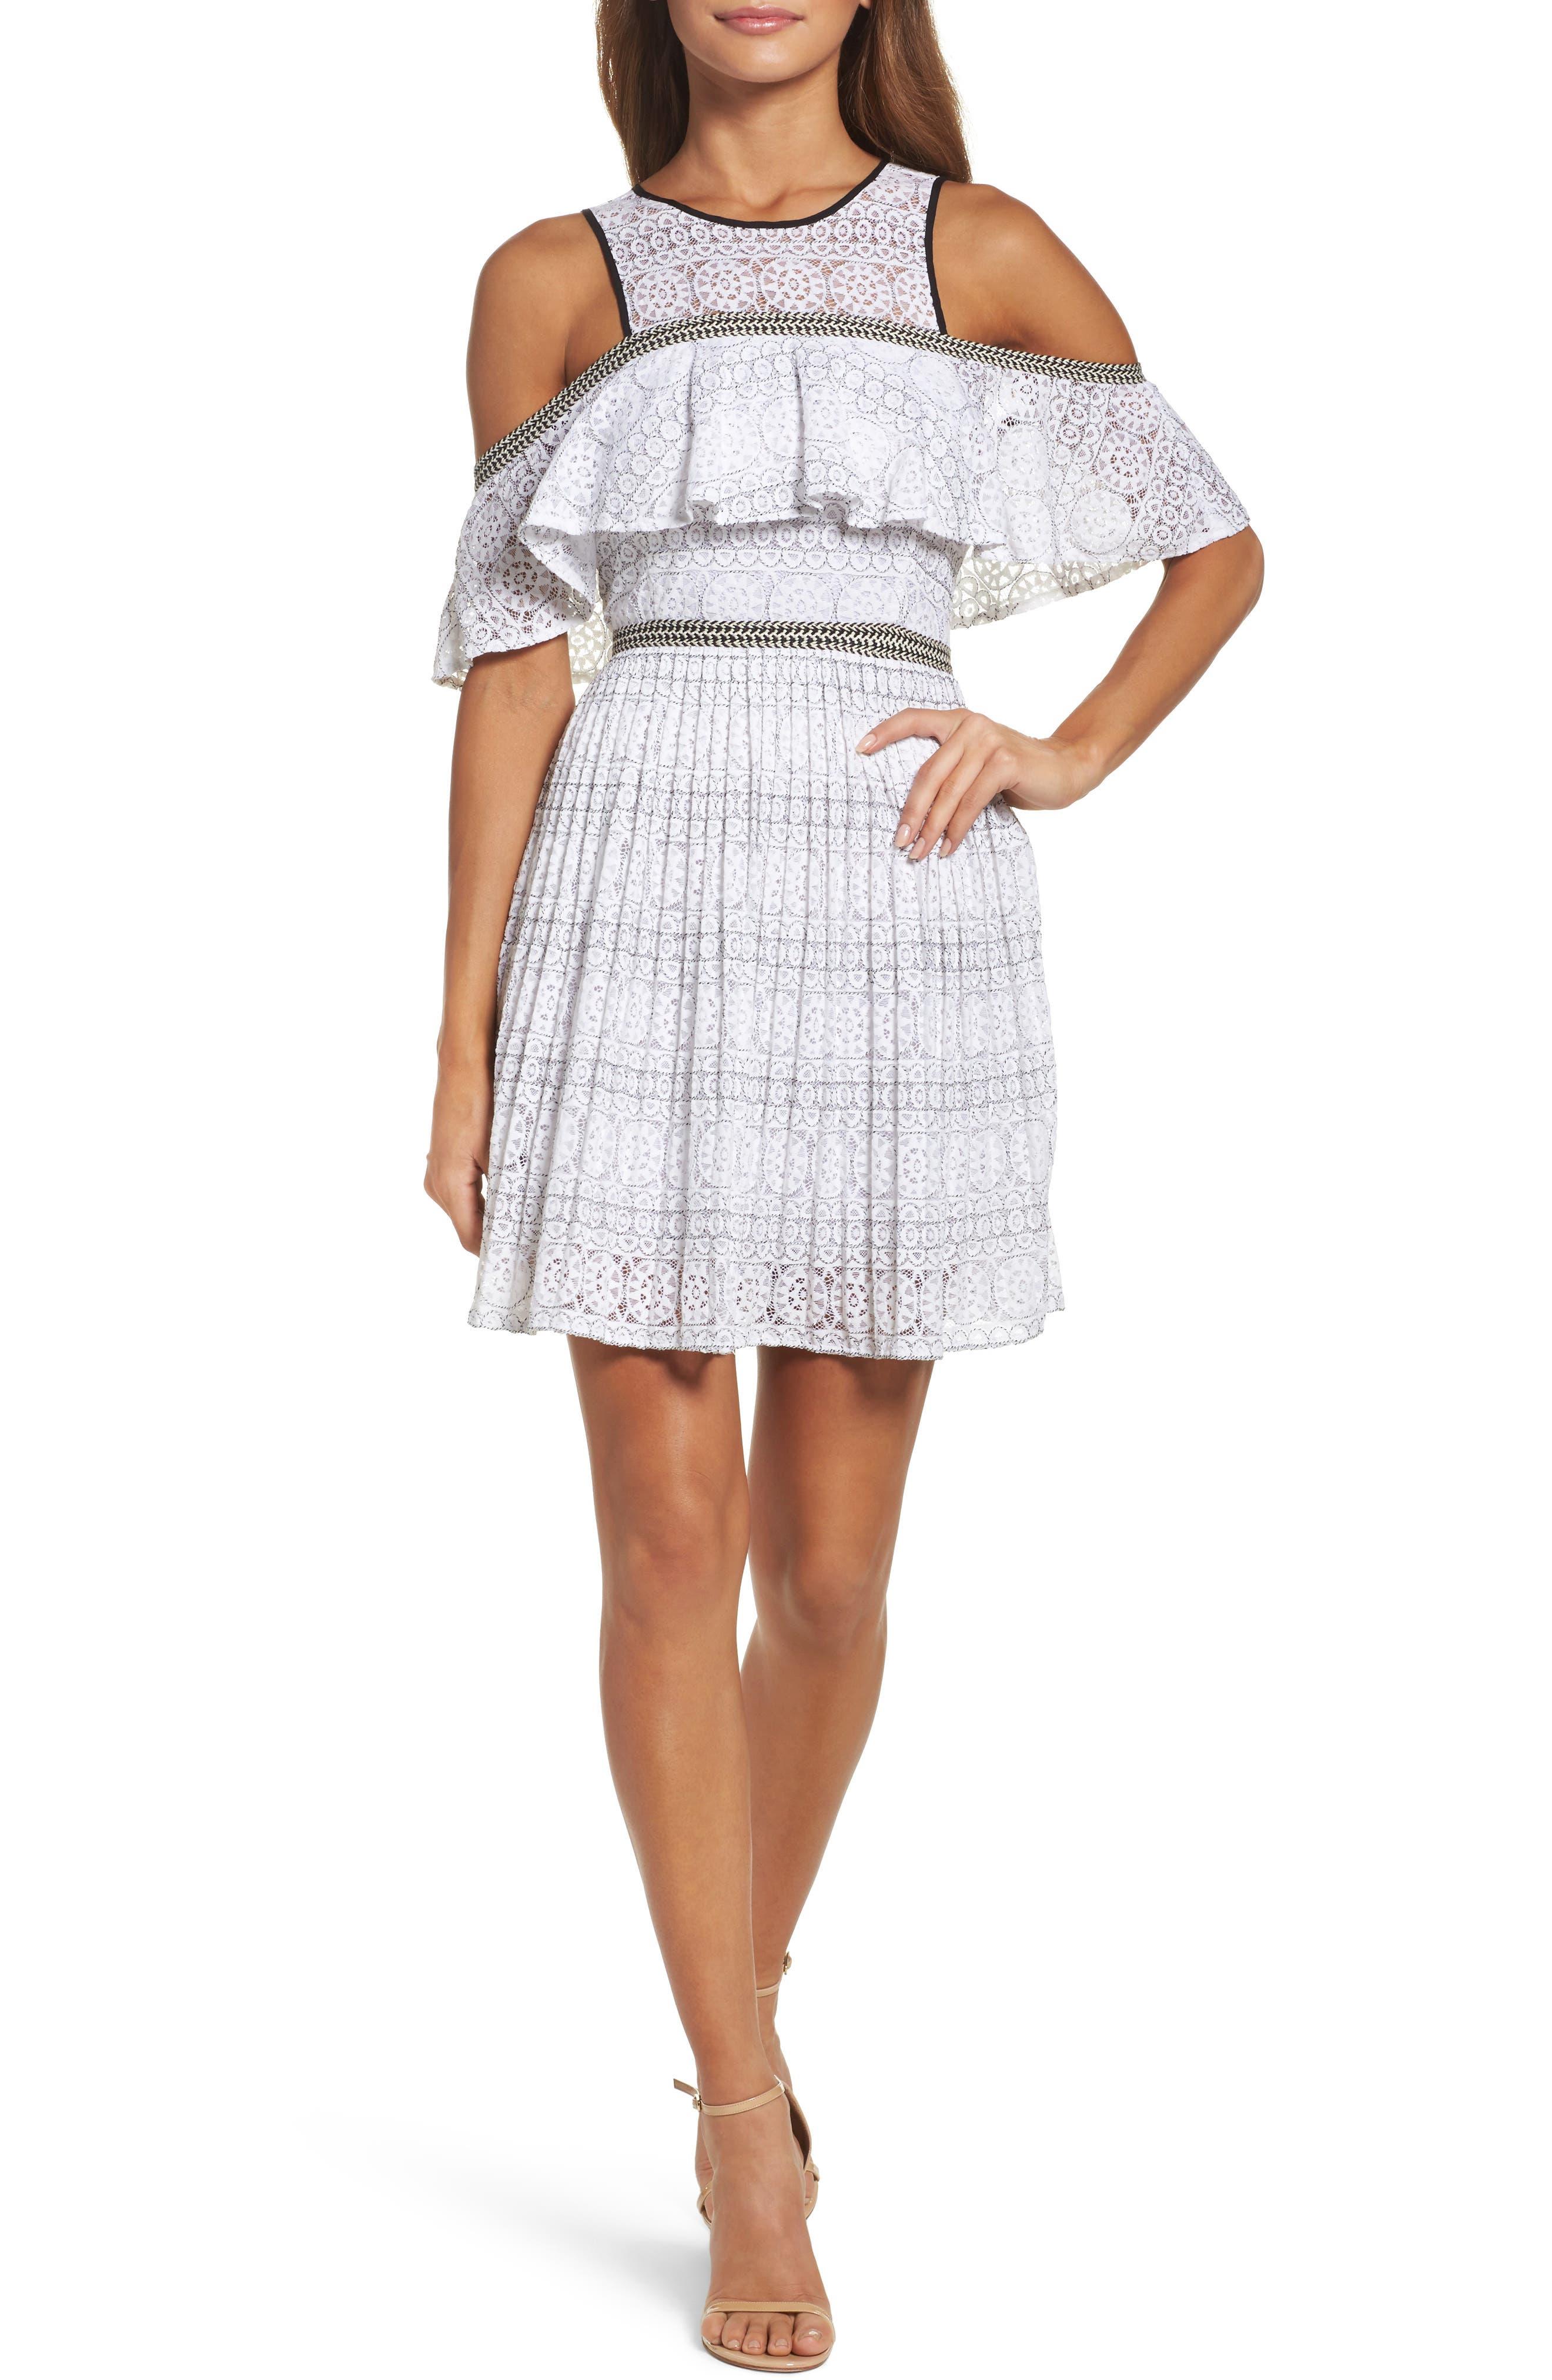 Main Image - Foxiedox Belinda Lace Cold Shoulder Dress